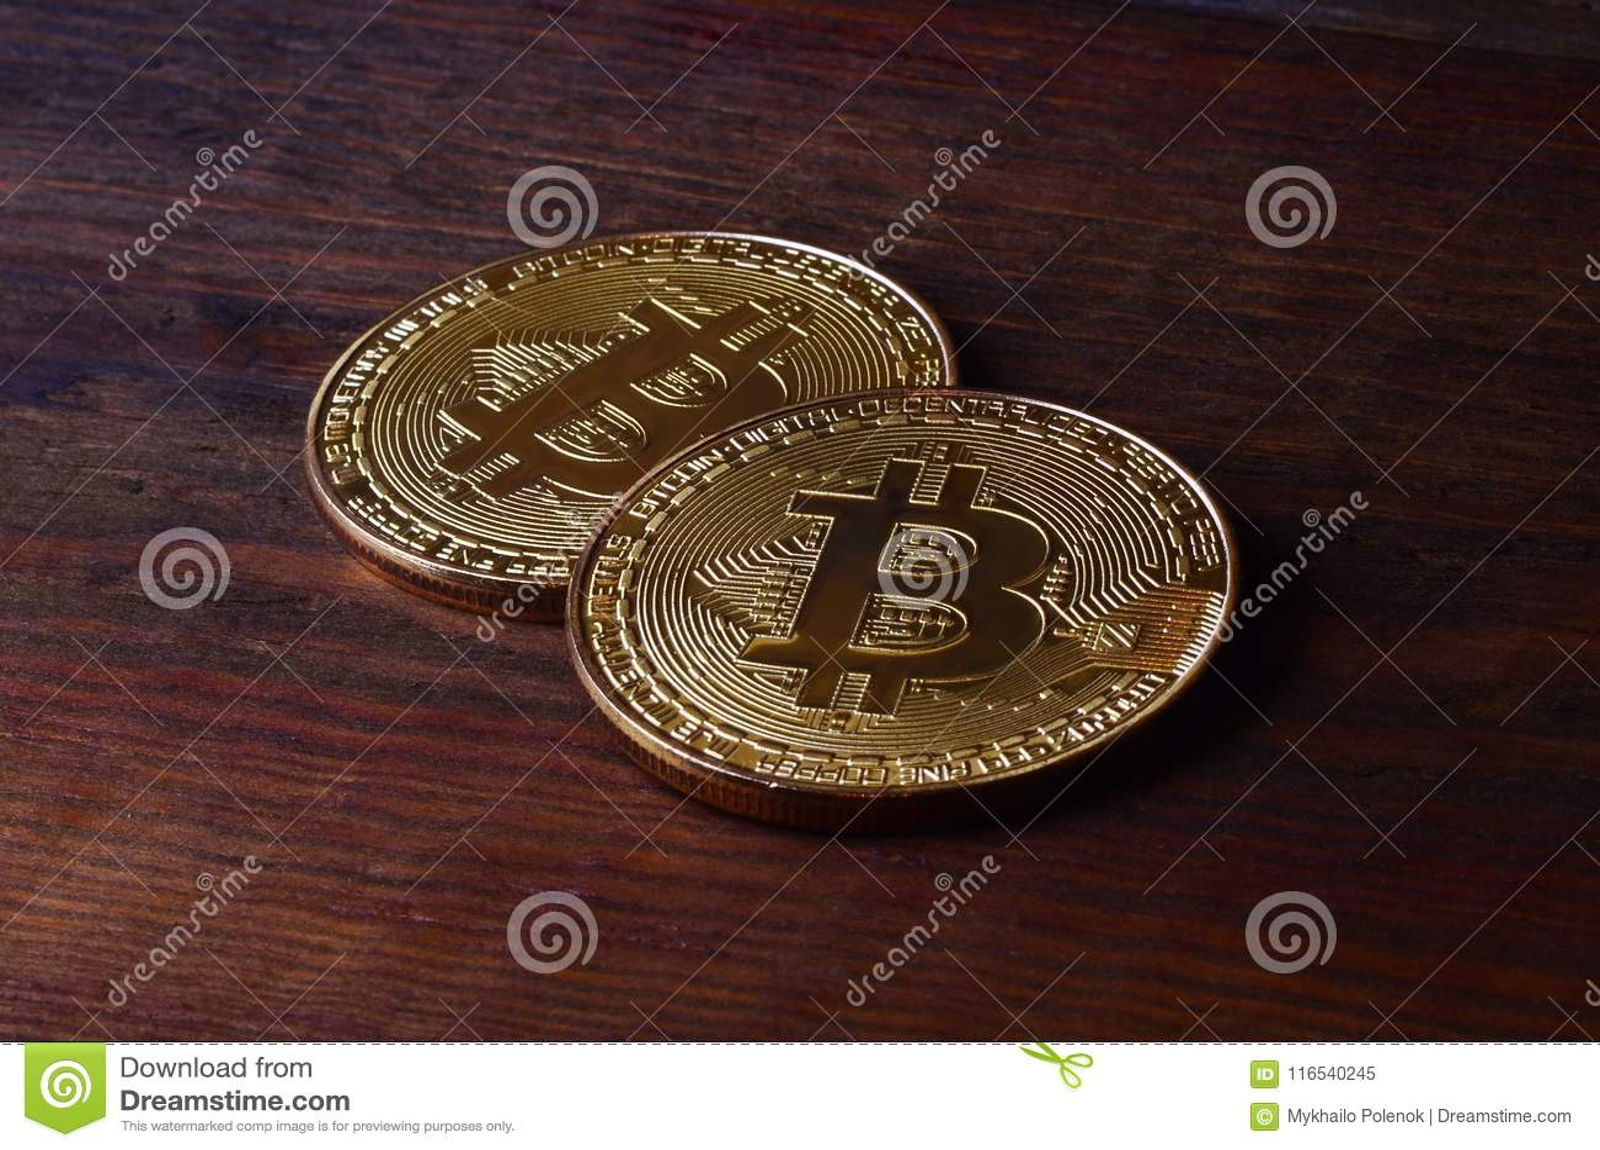 Two New Golden Physical Bitcoins Lies On Dark Wooden Backgound Close Up High Resolution